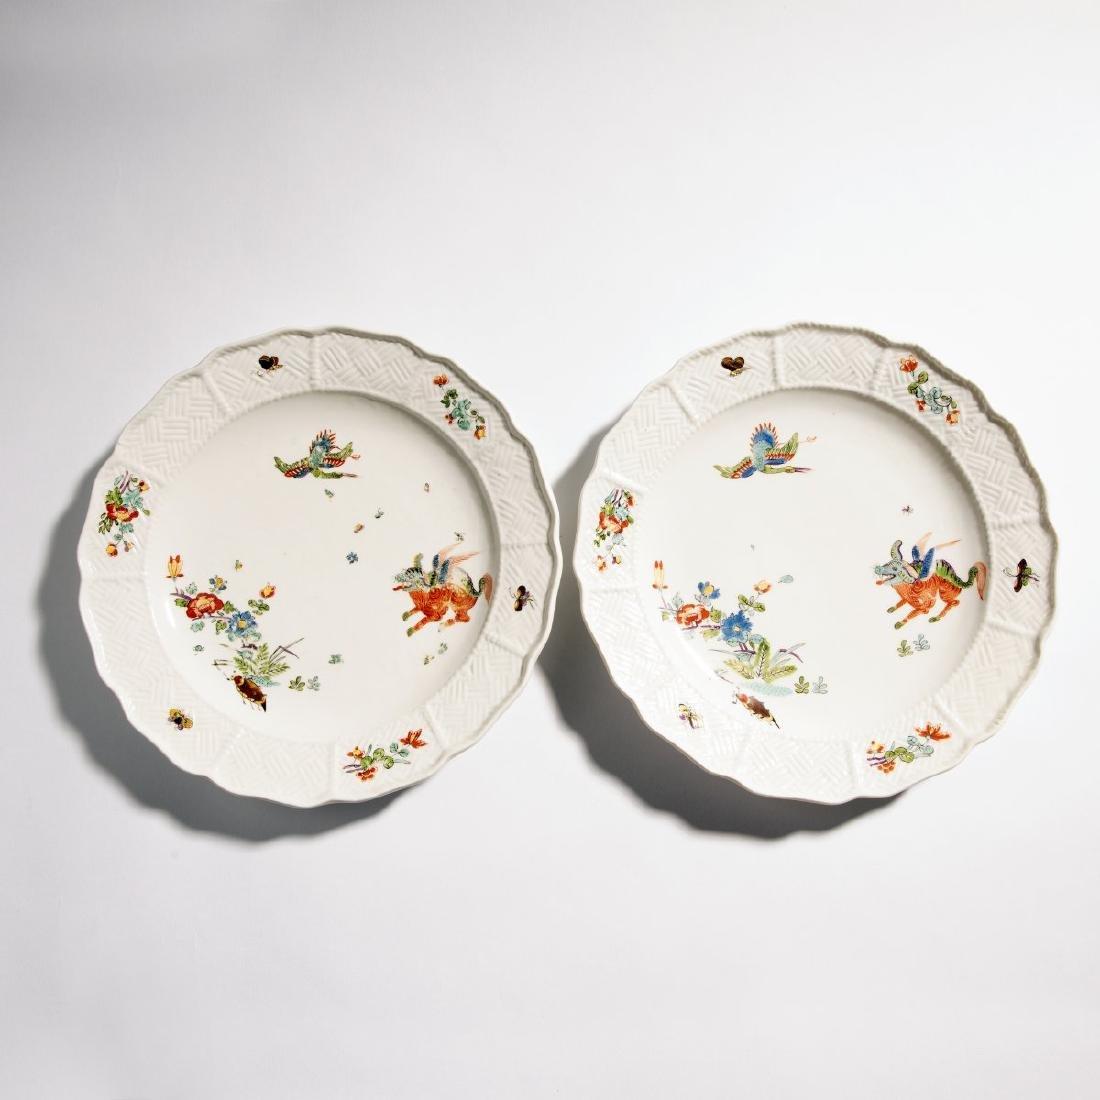 KPM Meissen, Two plates 'Flying Dog', c. 1730